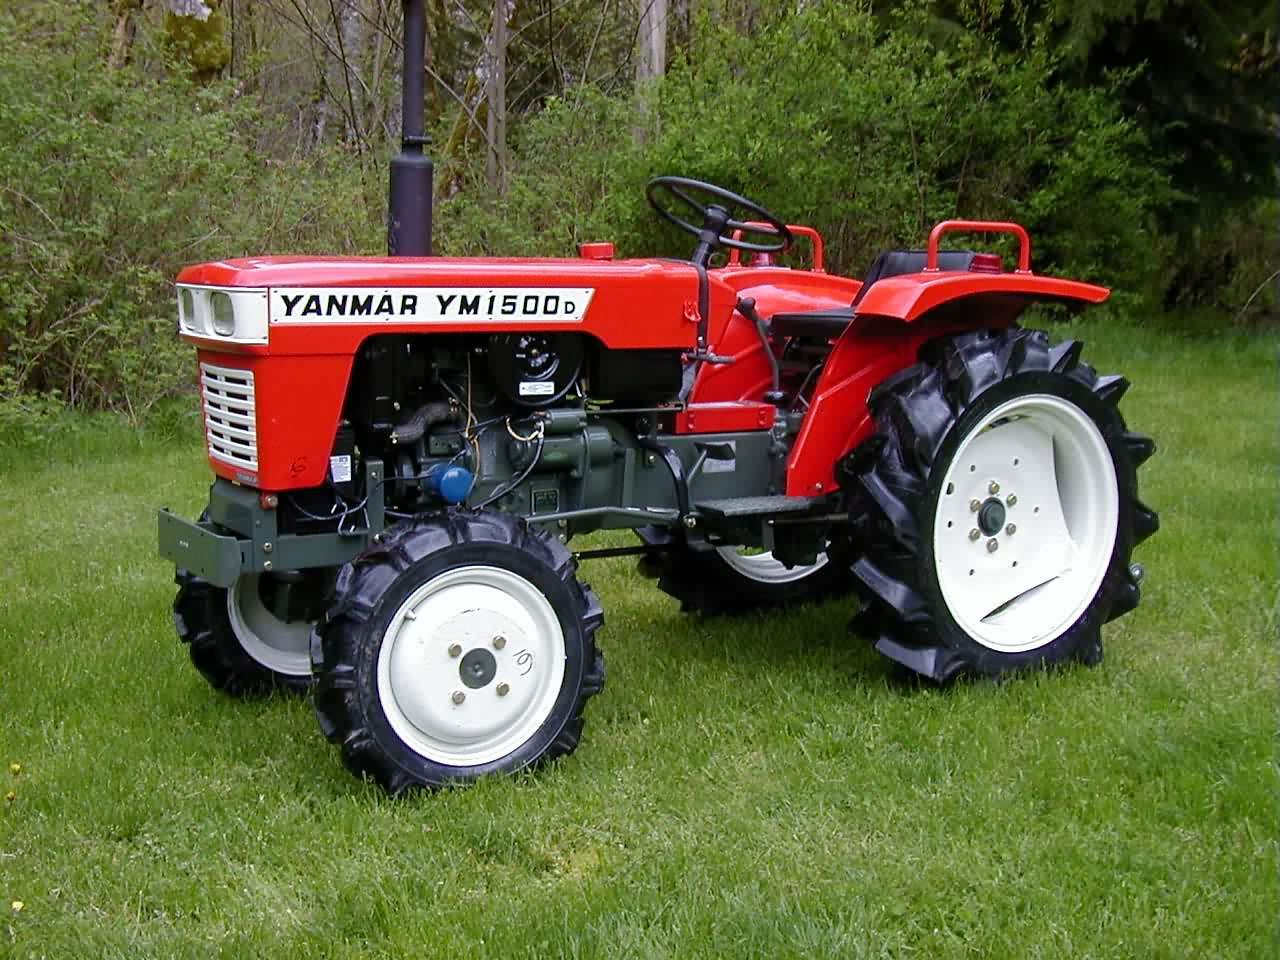 tractors yanmar tractors used fx alabama kubota grey yanmar [ 1280 x 960 Pixel ]